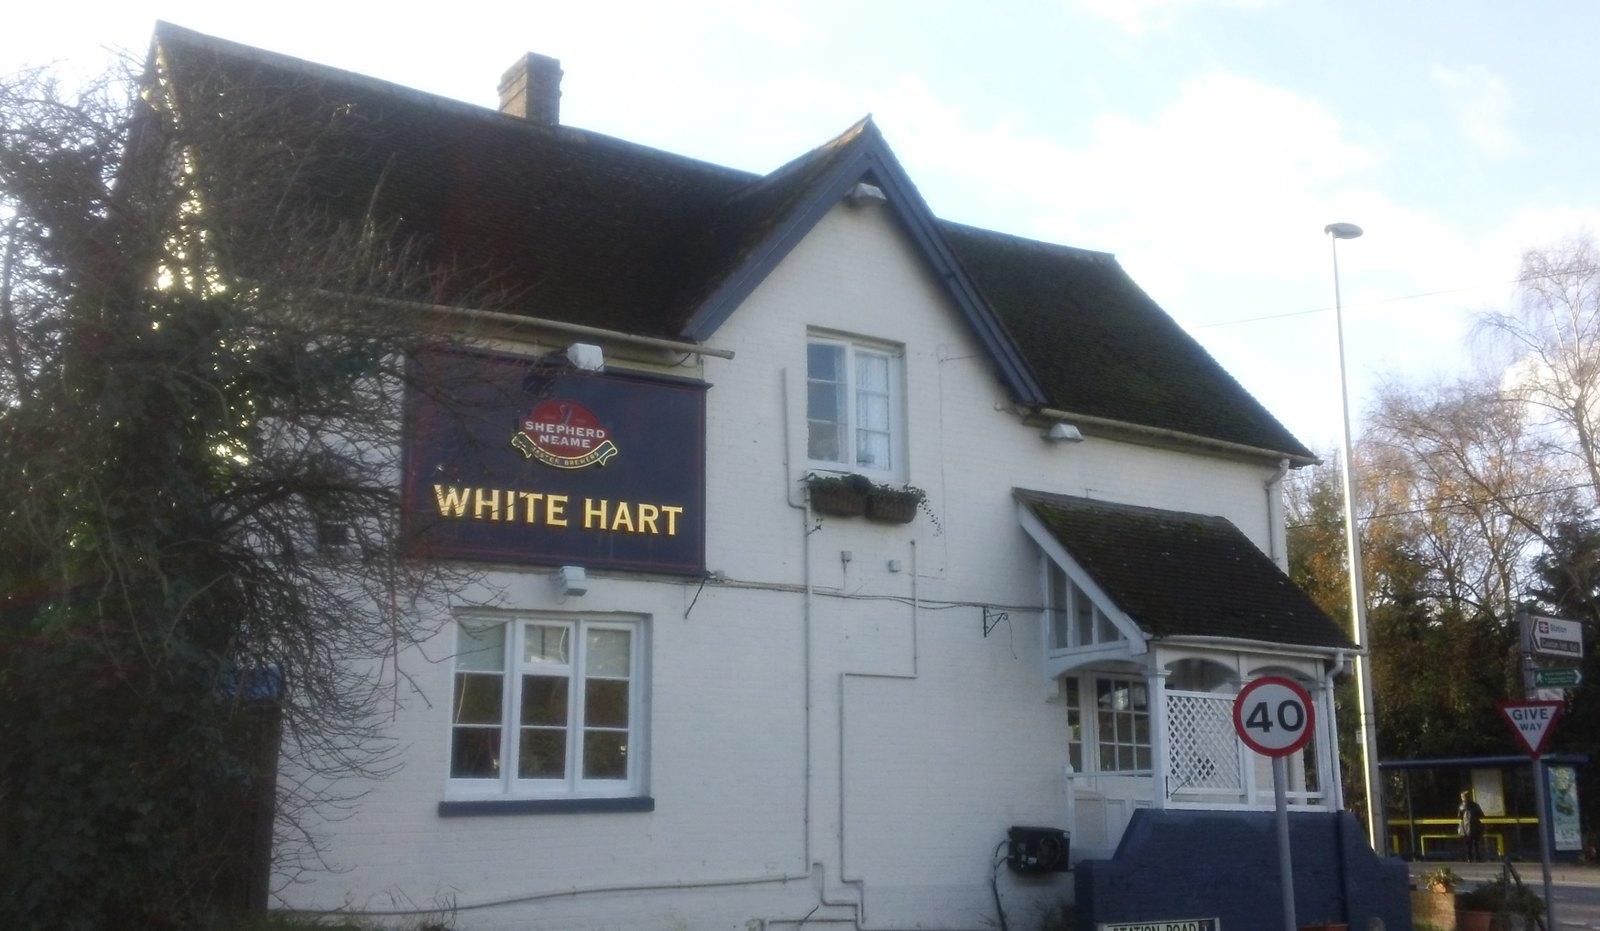 White Hart, Cuxton